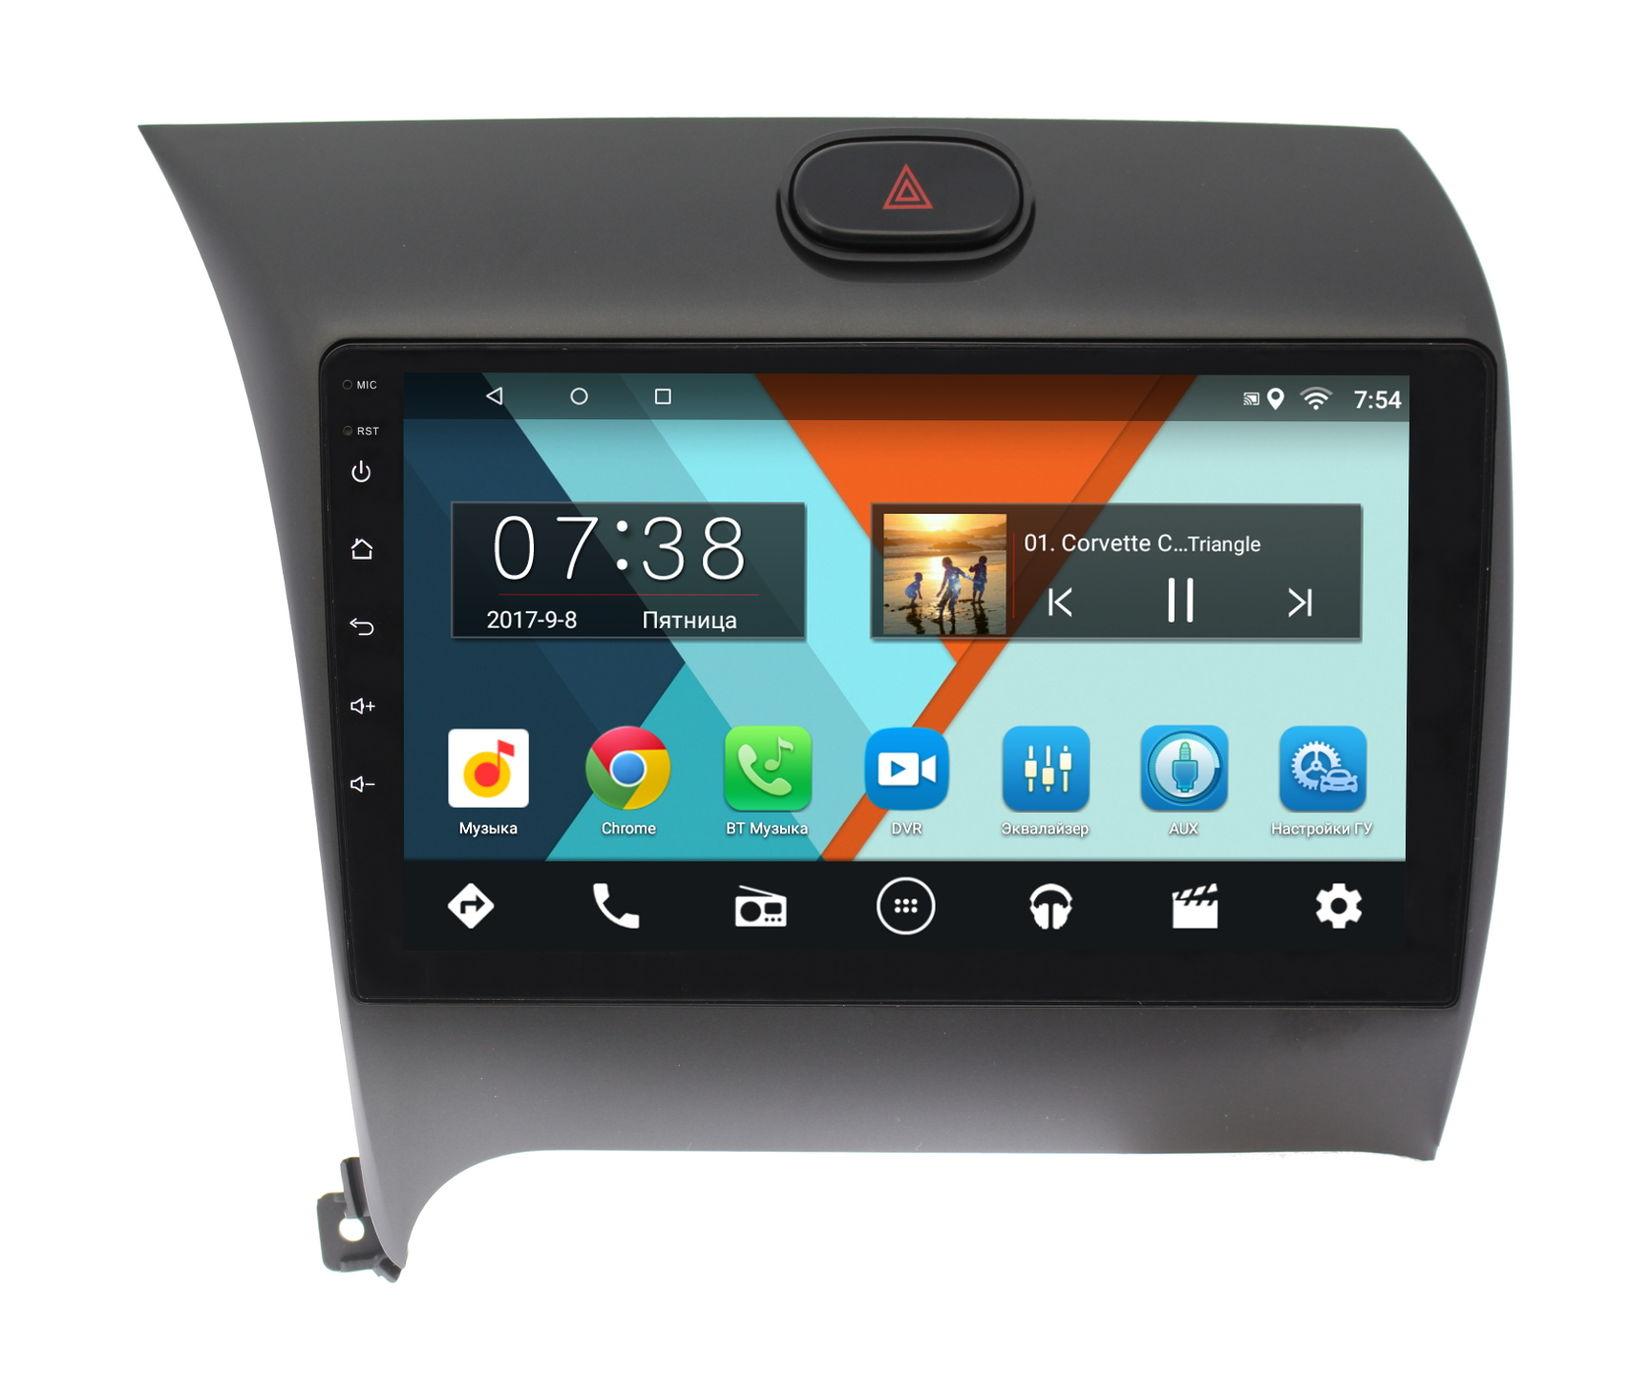 Штатная магнитола для Kia Cerato III 2013-2017 Wide Media MT9014MF Android 6.0.1 штатная магнитола для kia sportage iii 2010 2016 letrun 2020 android 6 0 1